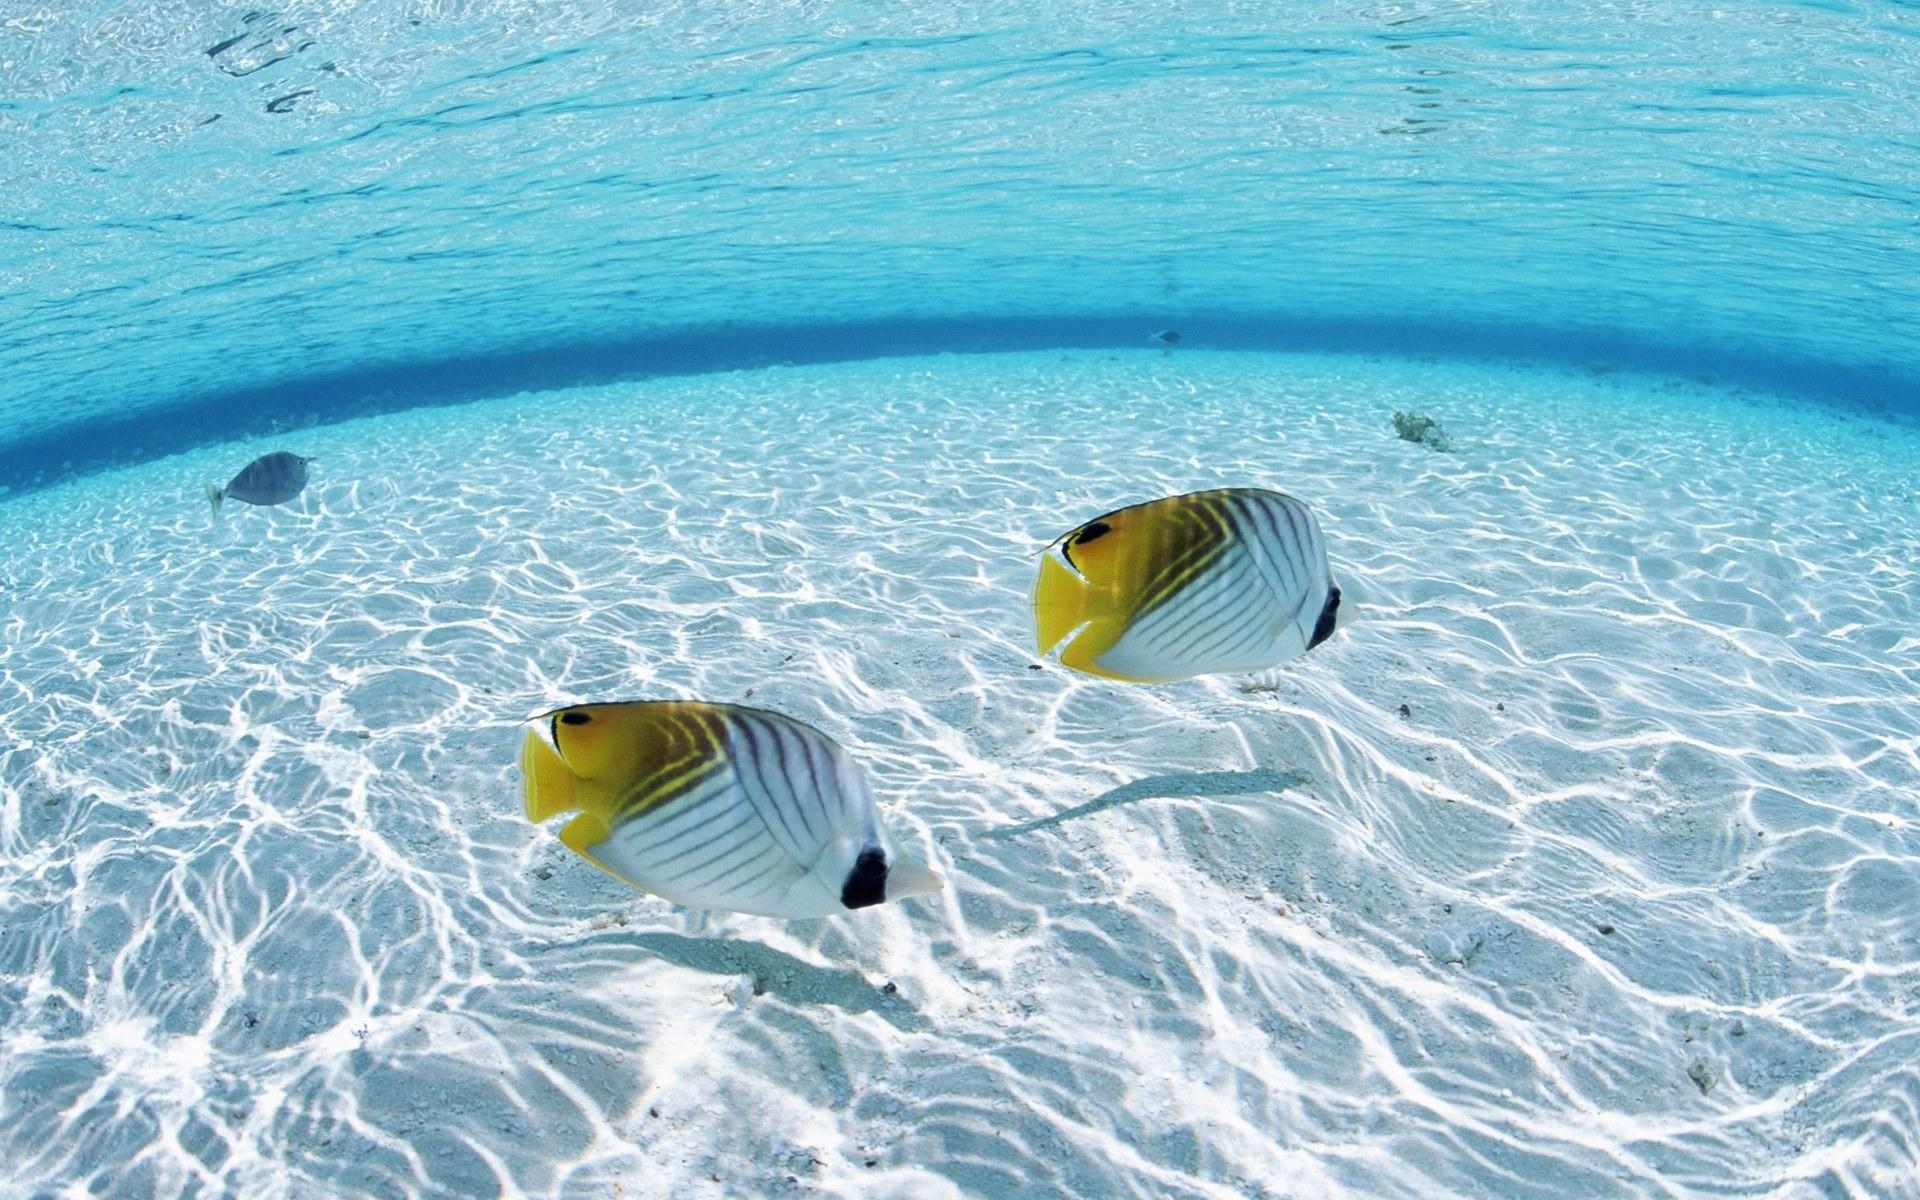 the ocean desktop wallpaper download fish in the ocean wallpaper in hd .